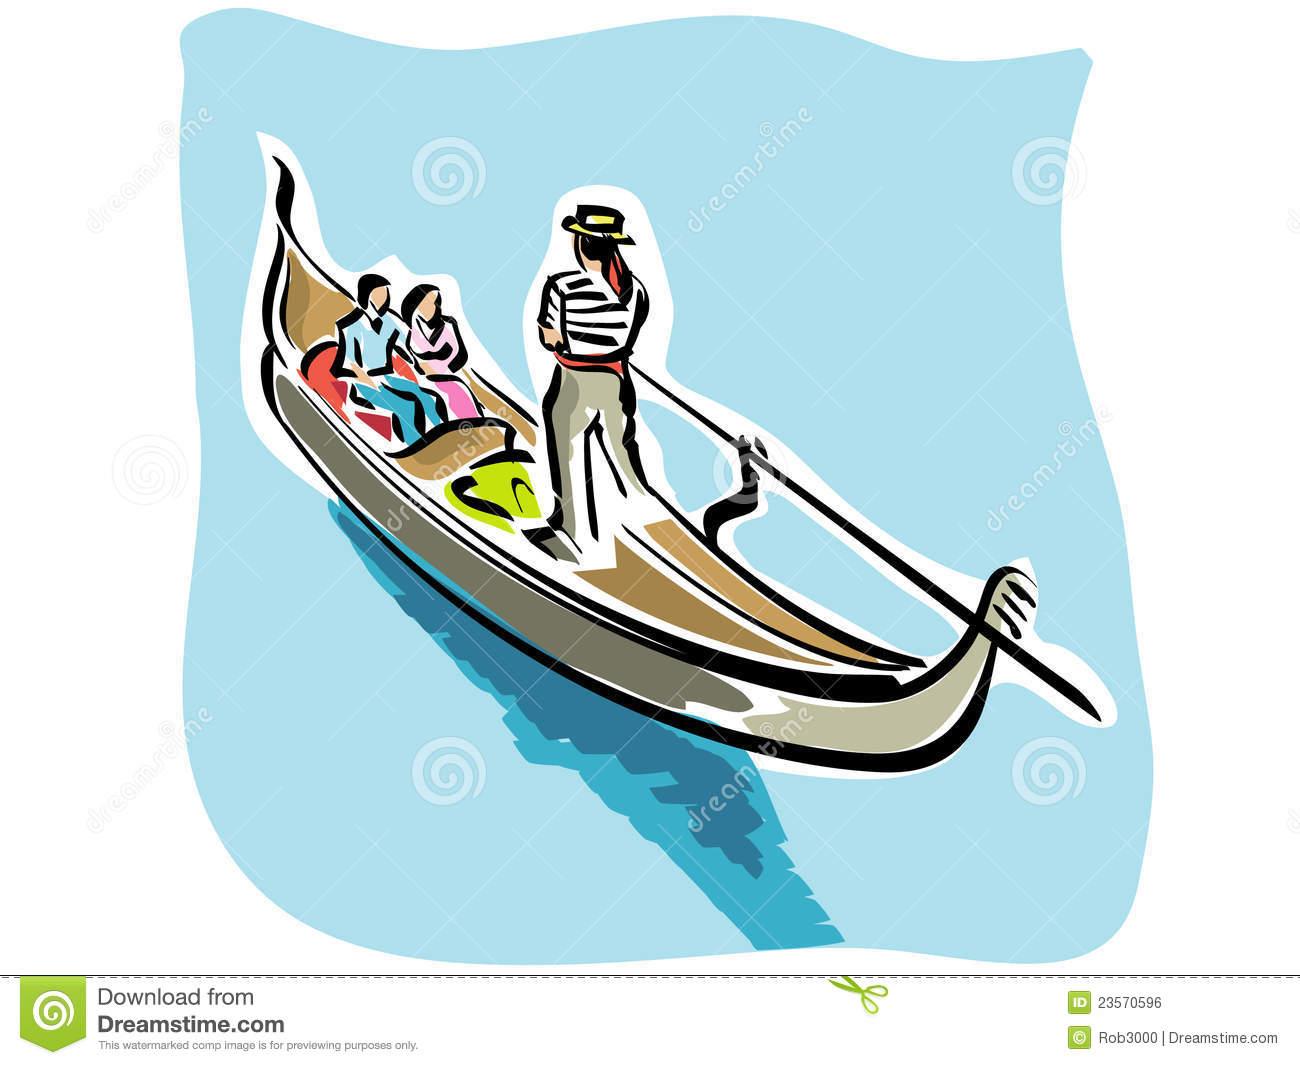 boat ride clipart - photo #20